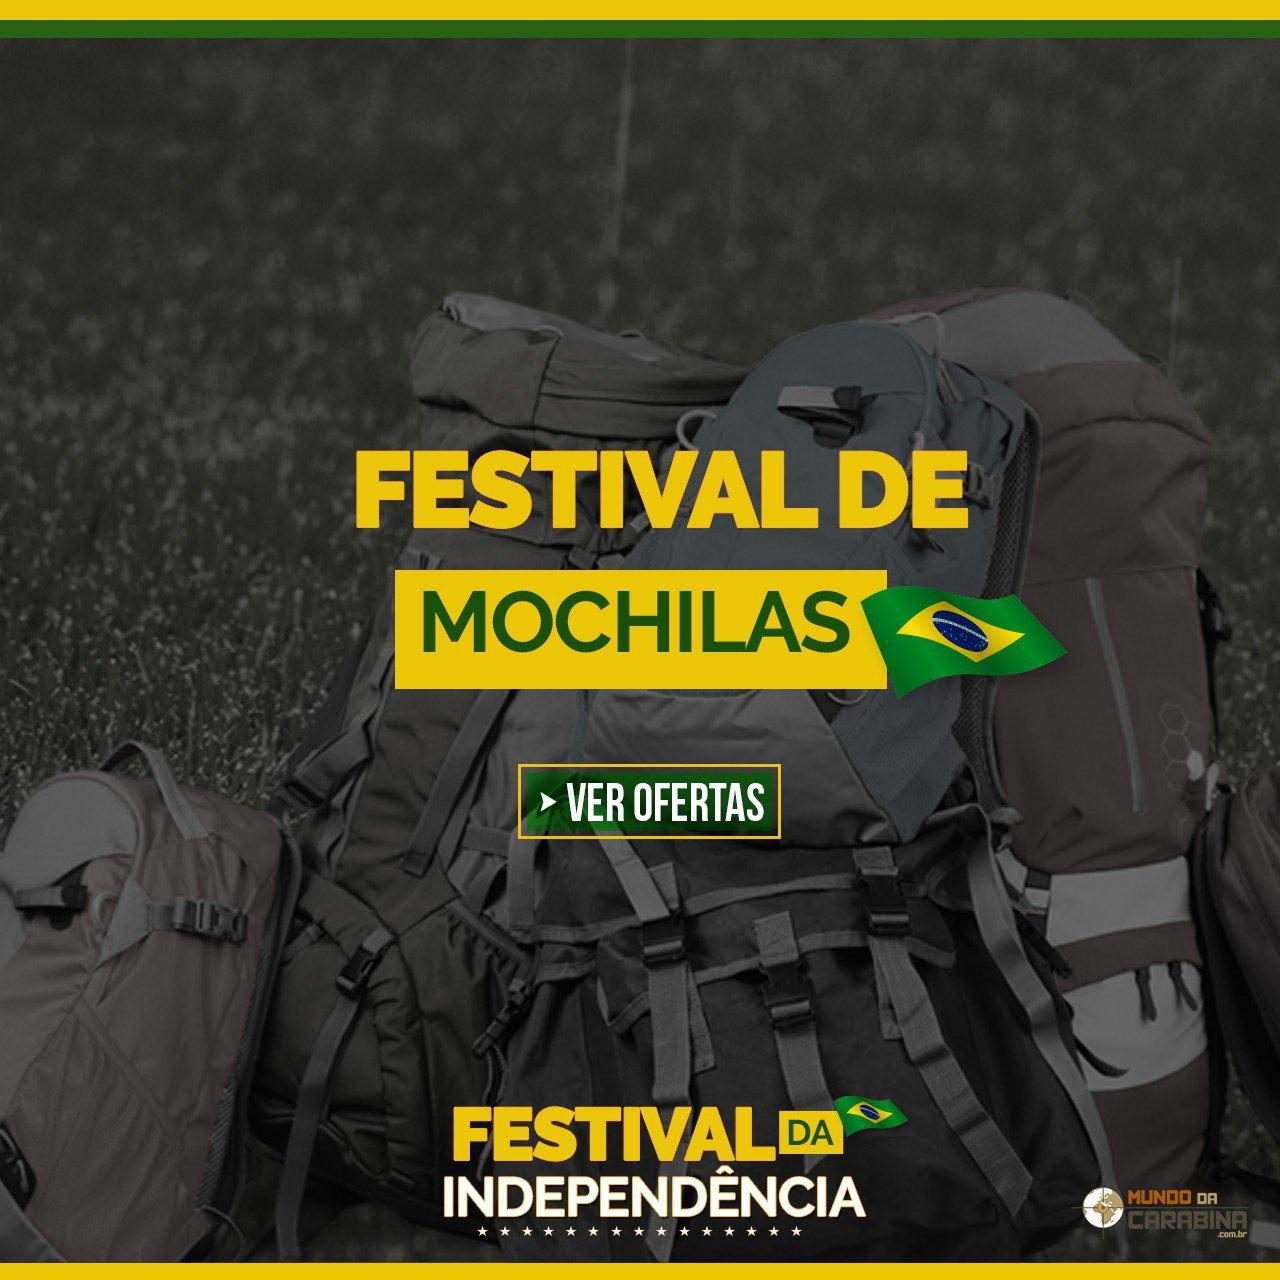 FESTIVAL DE MOCHILAS